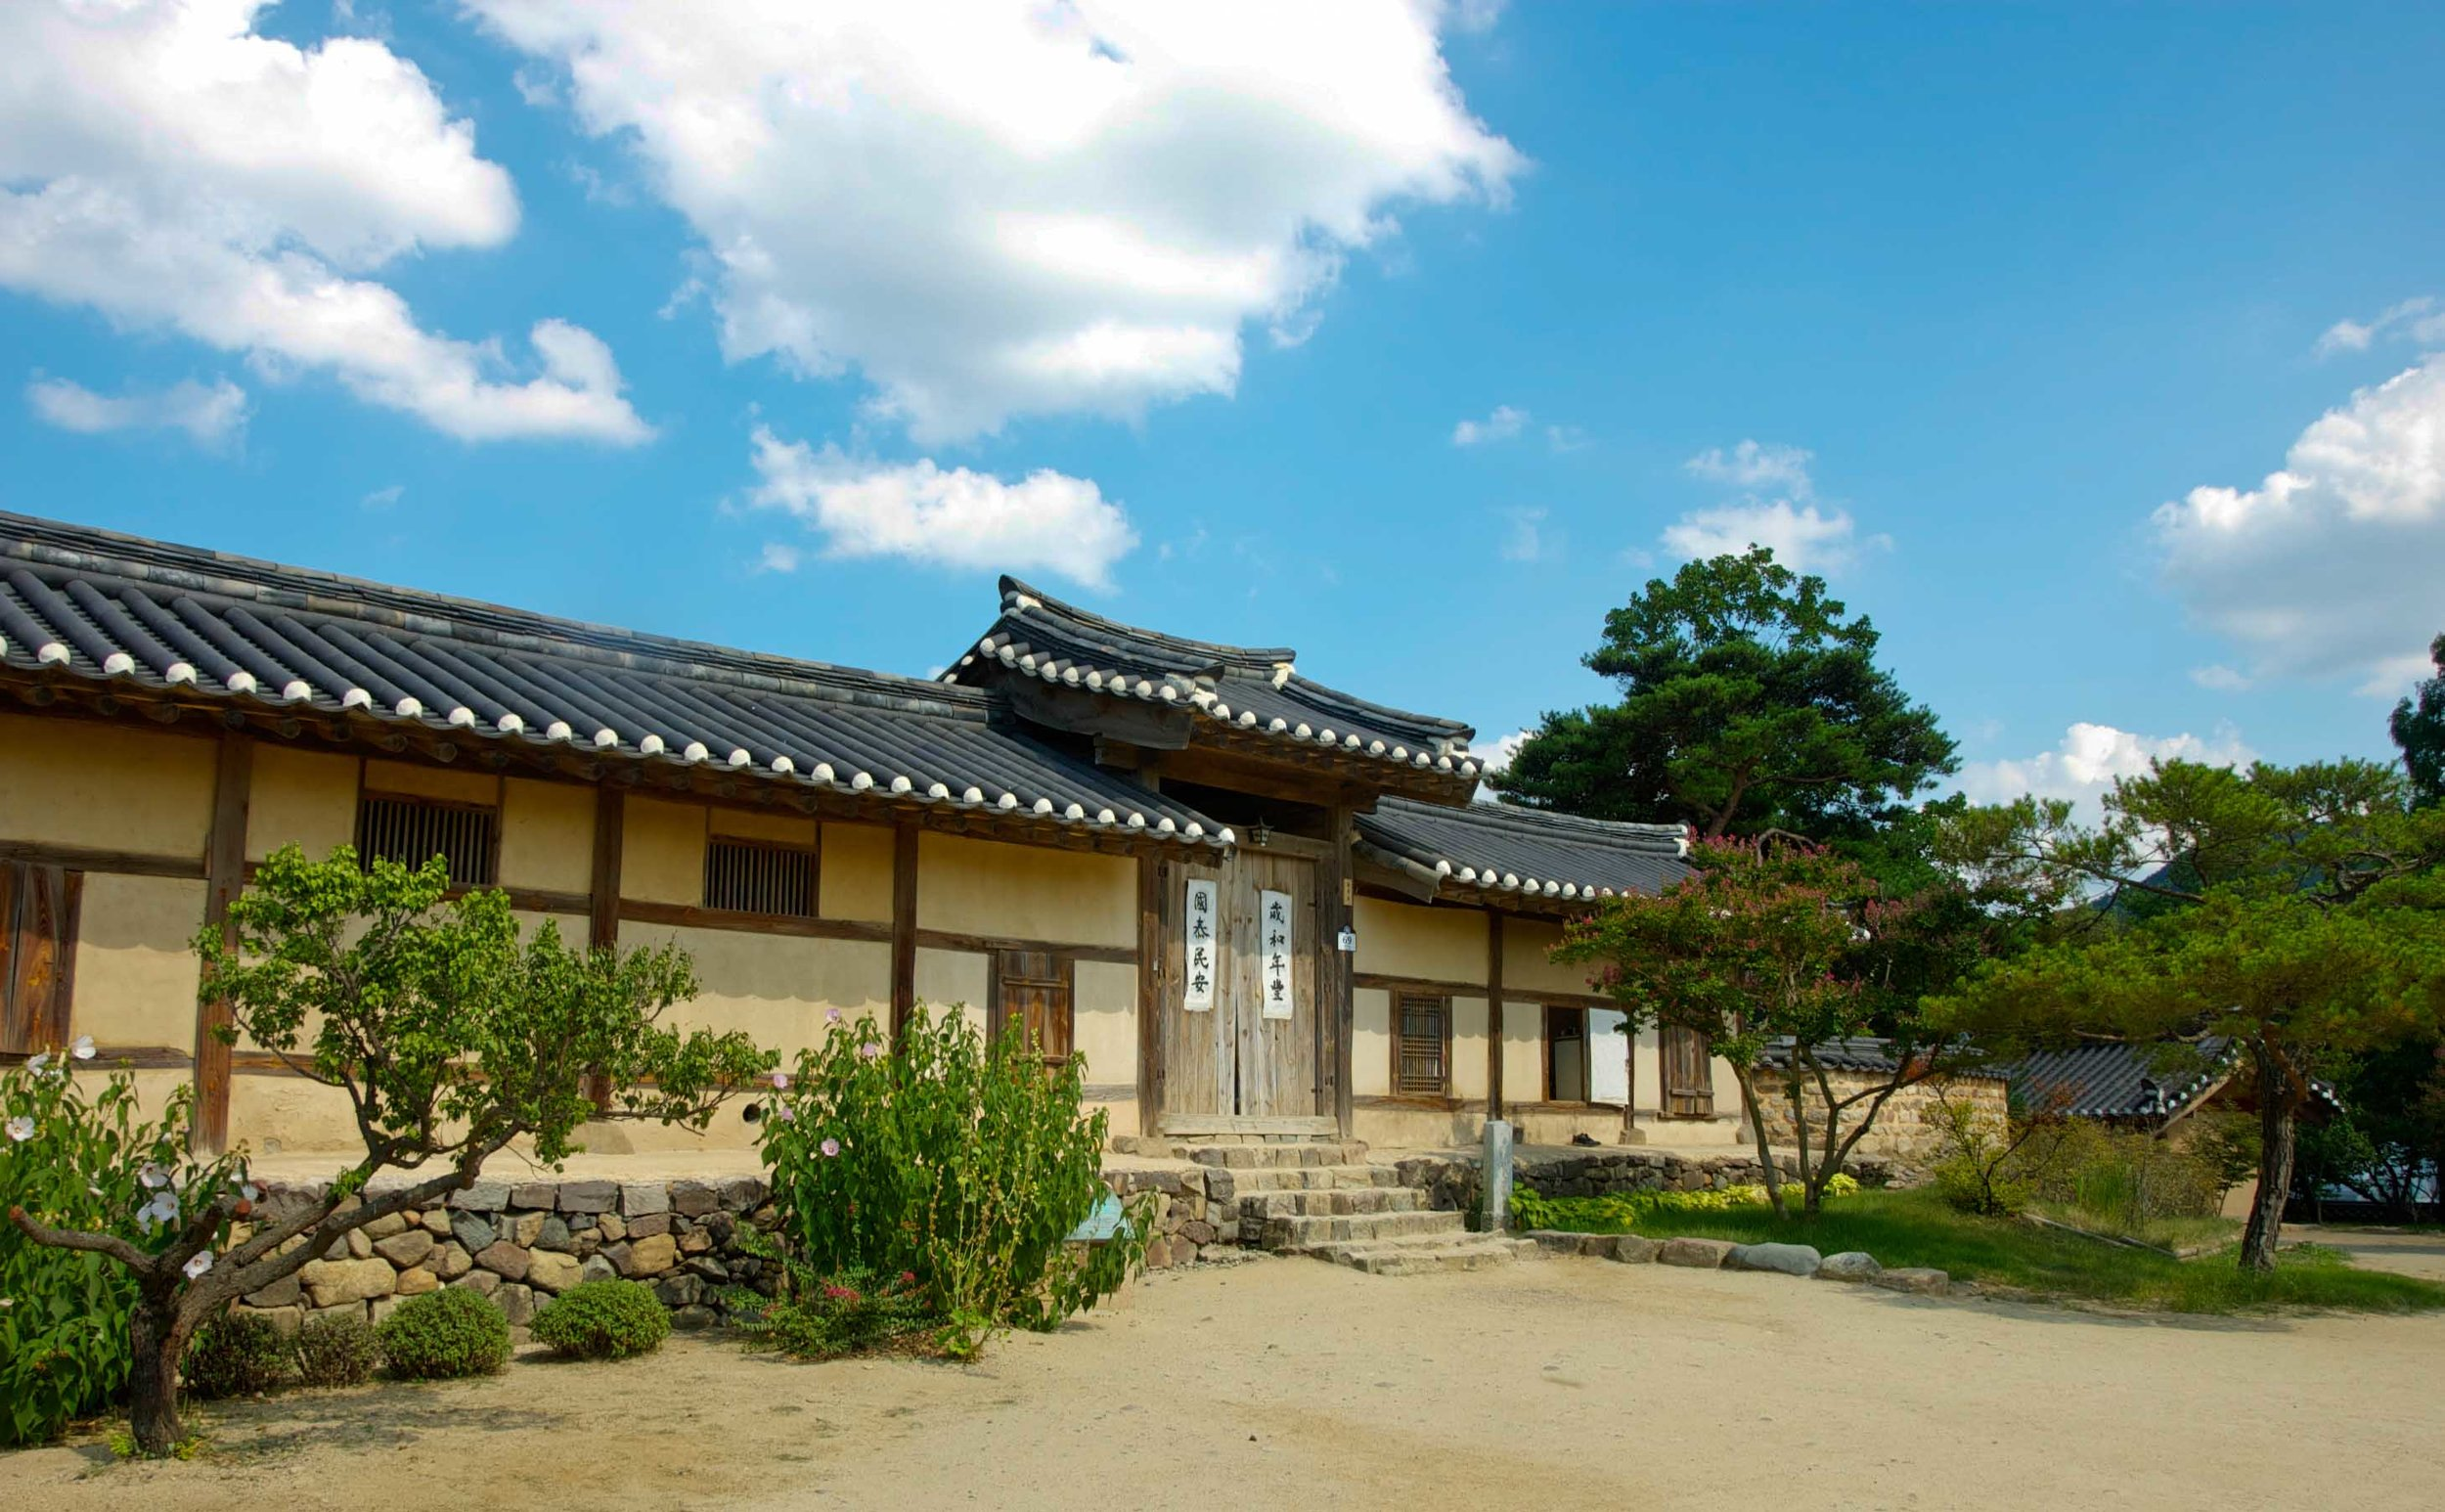 UNESCO, South Korea, Hahoe Village (하회 마을)